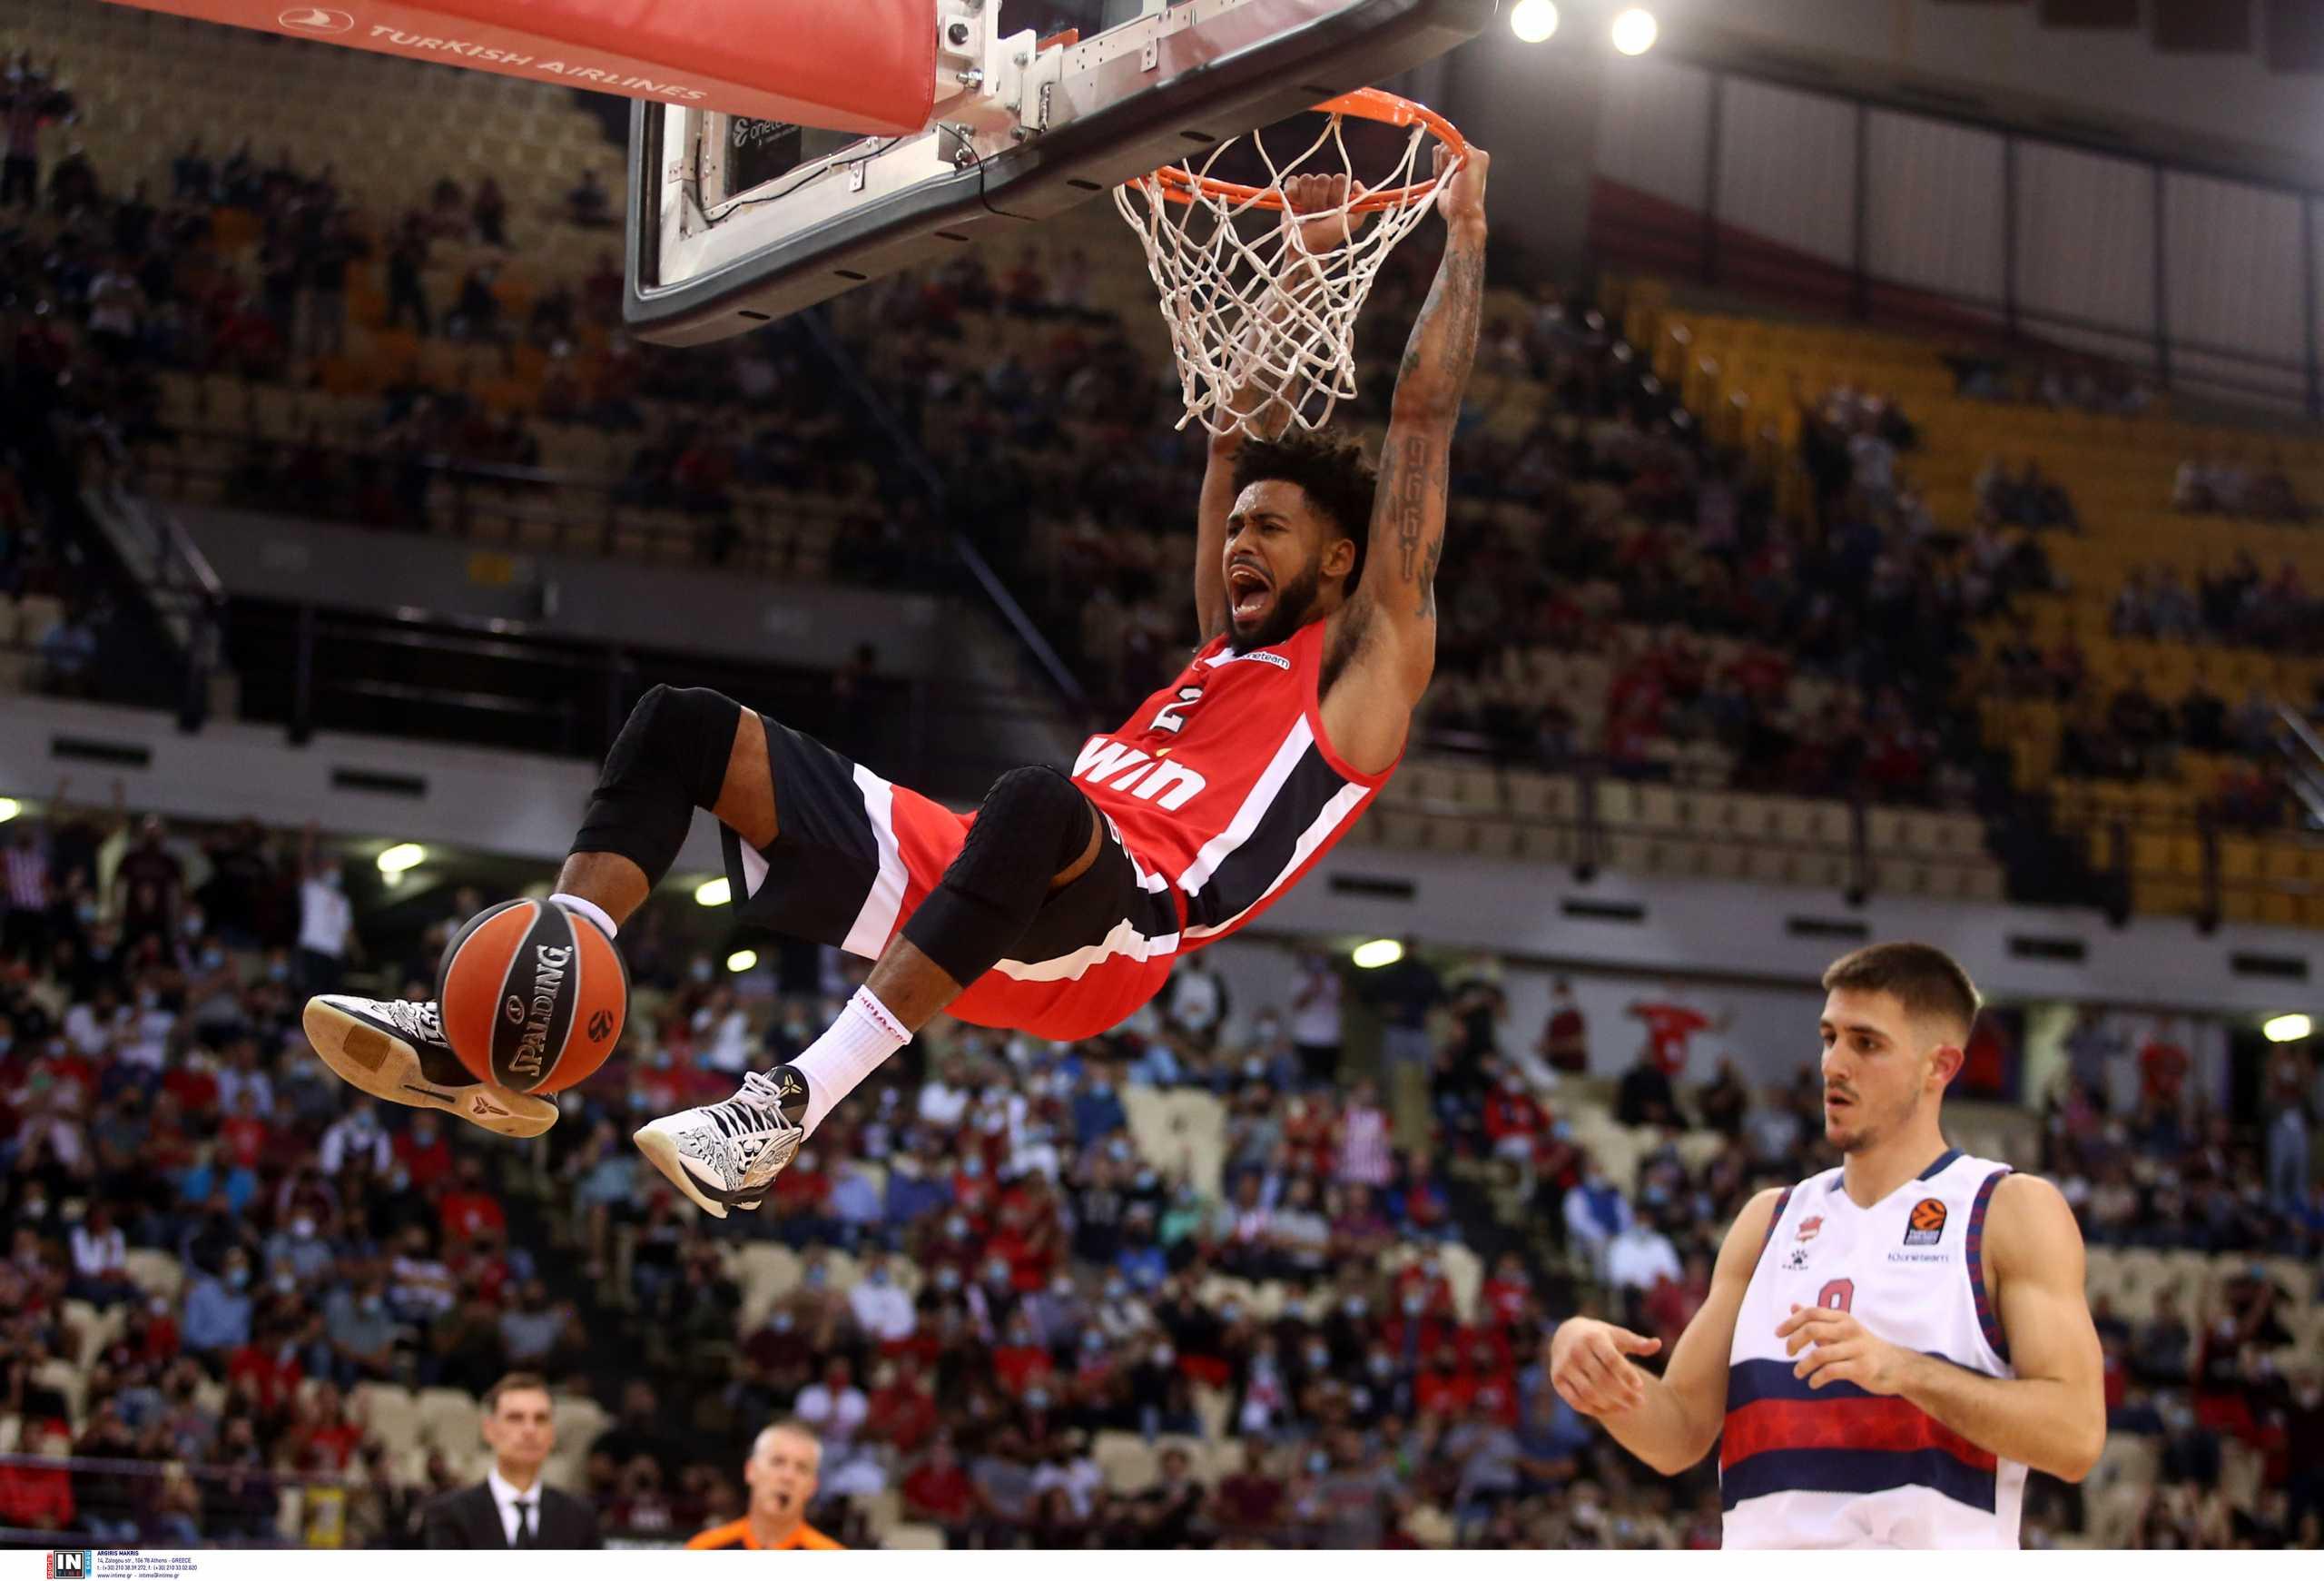 Euroleague, Ολυμπιακός – Μπασκόνια 75-50: Οι ερυθρόλευκοι ισοπέδωσαν τους Βάσκους